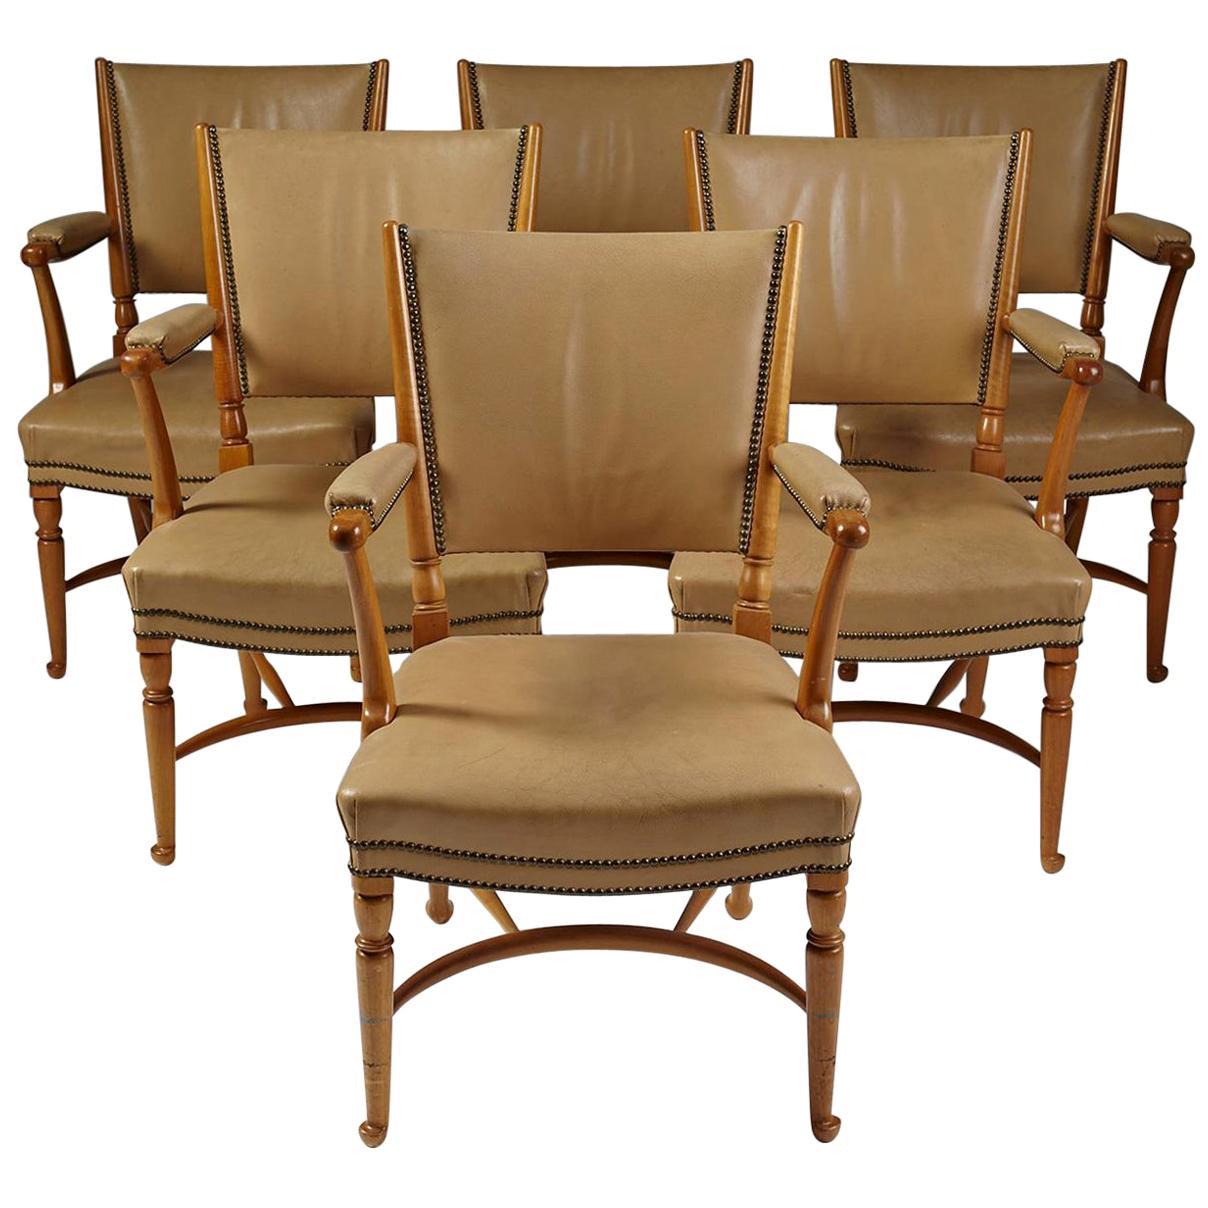 Set of Six Chairs Designed by Josef Frank for Svensk Tenn, Model 725, Sweden